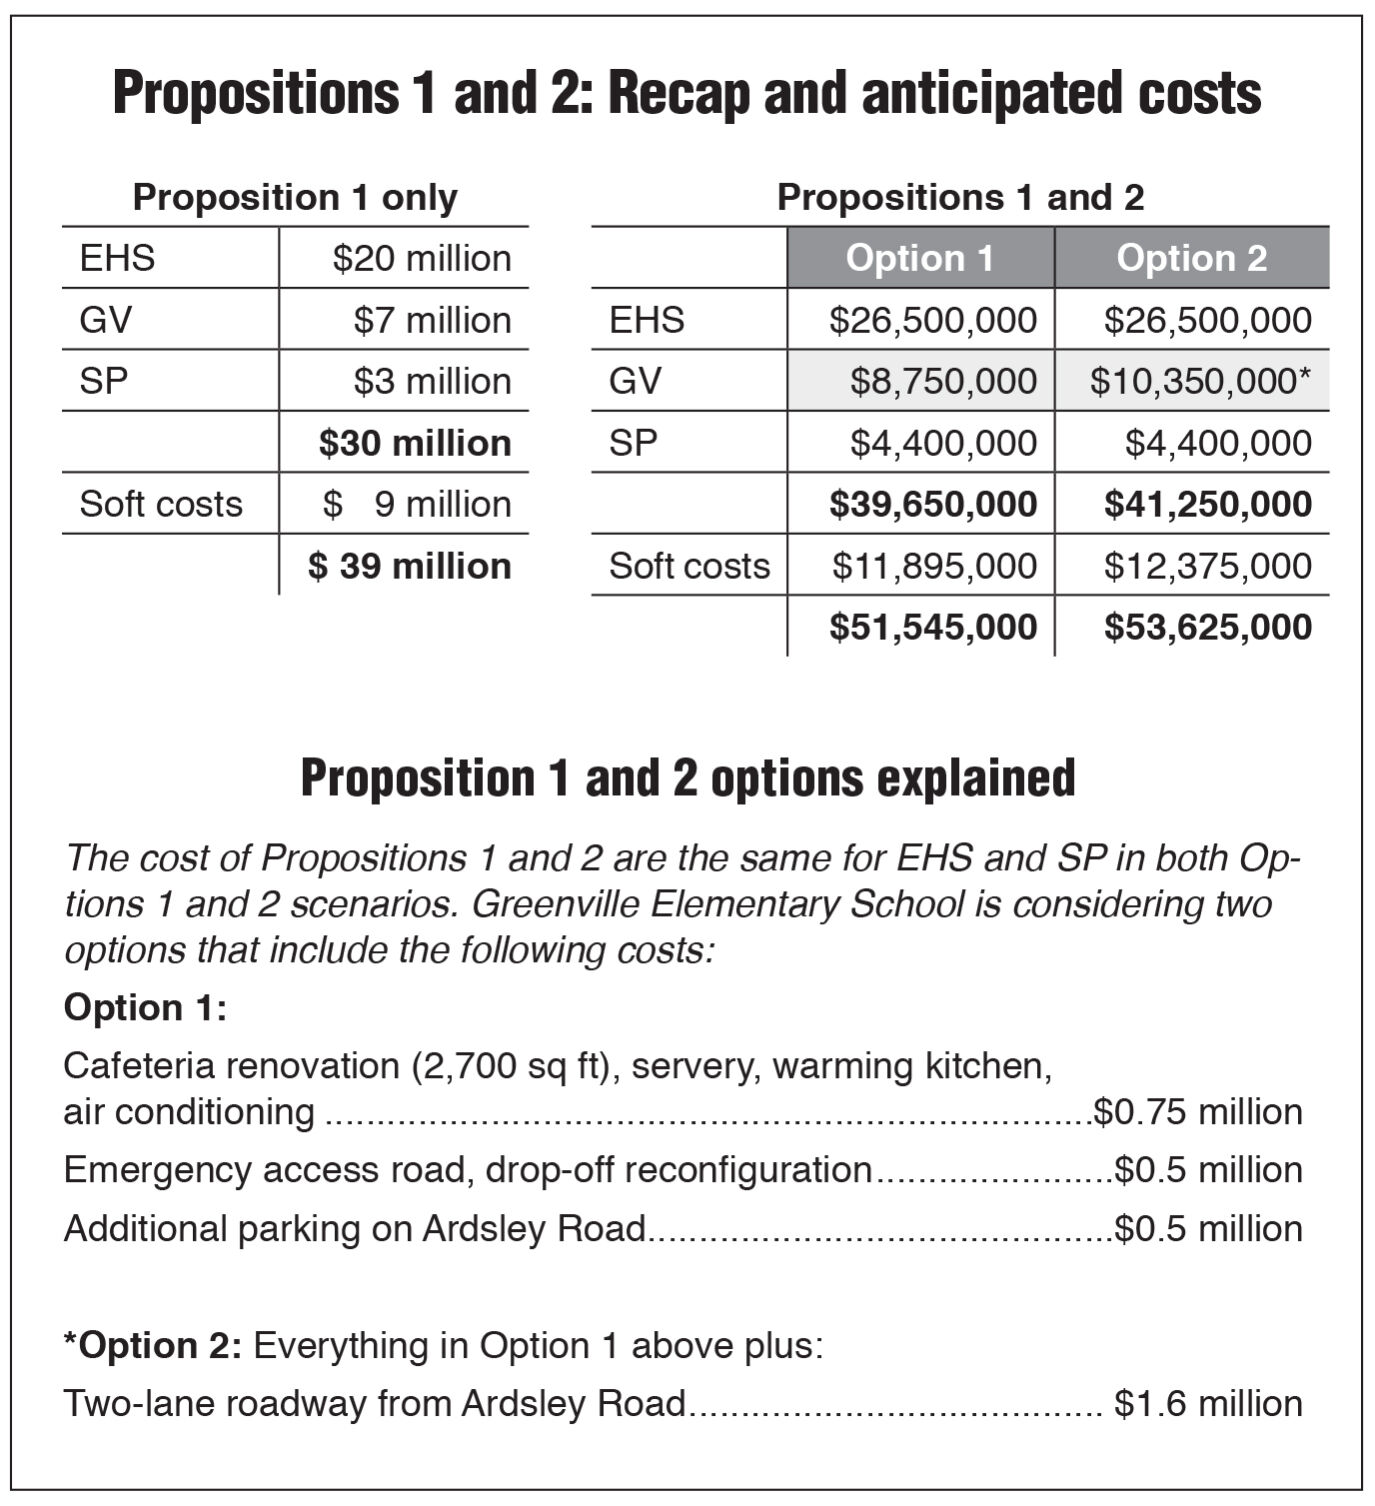 edgemont school budget bon chart 1/15 issue .jpg